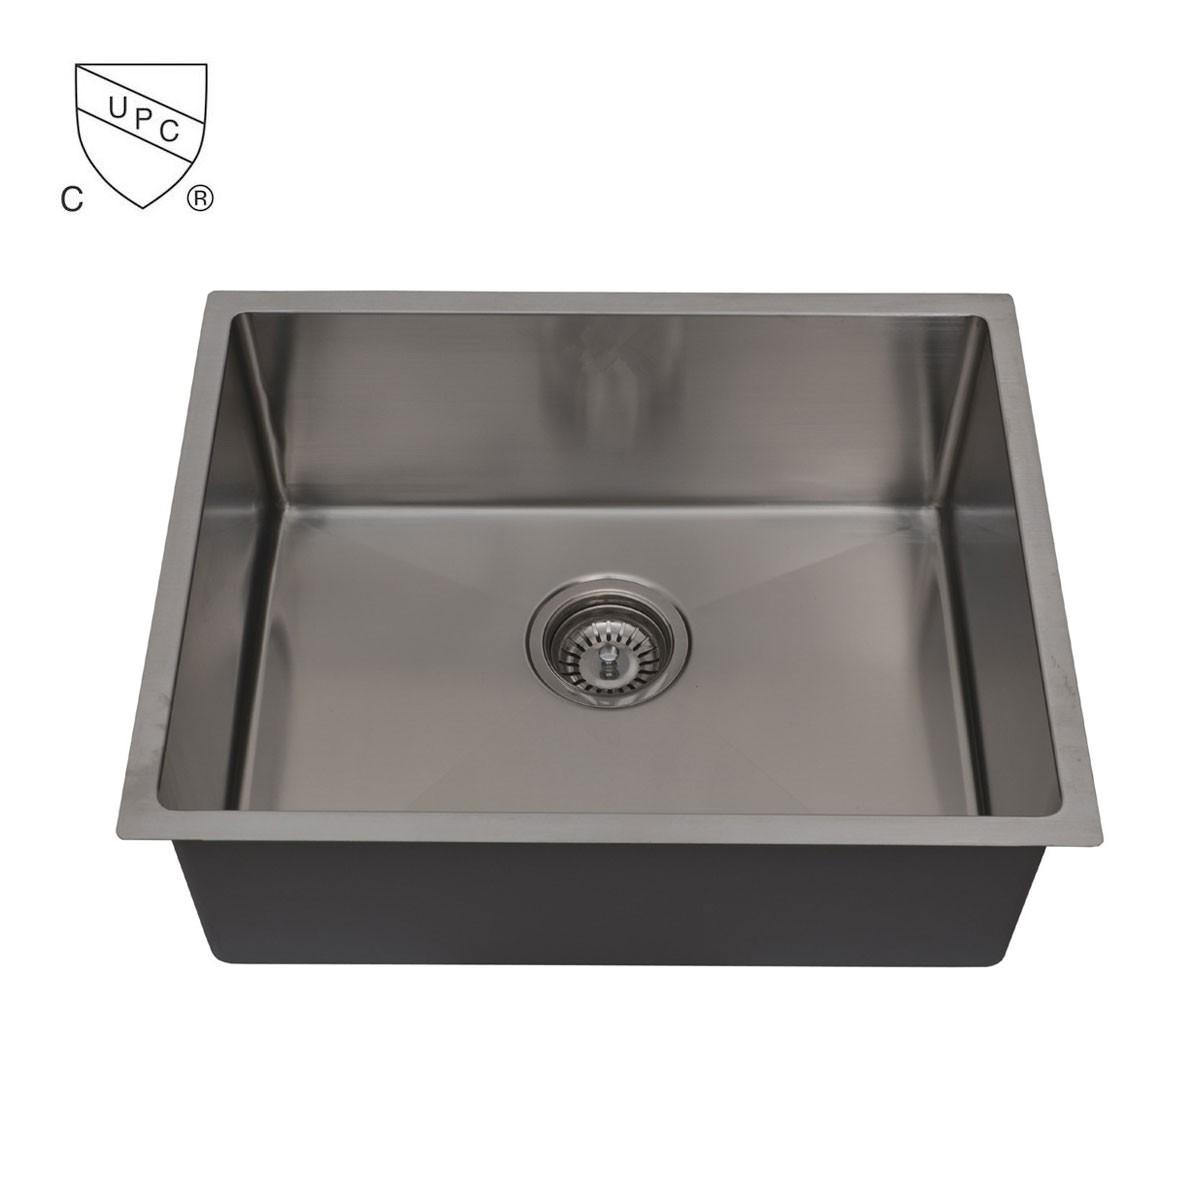 Stainless Steel Kitchen Sink, Single Bowl (DK-SC-AR2318-R10)